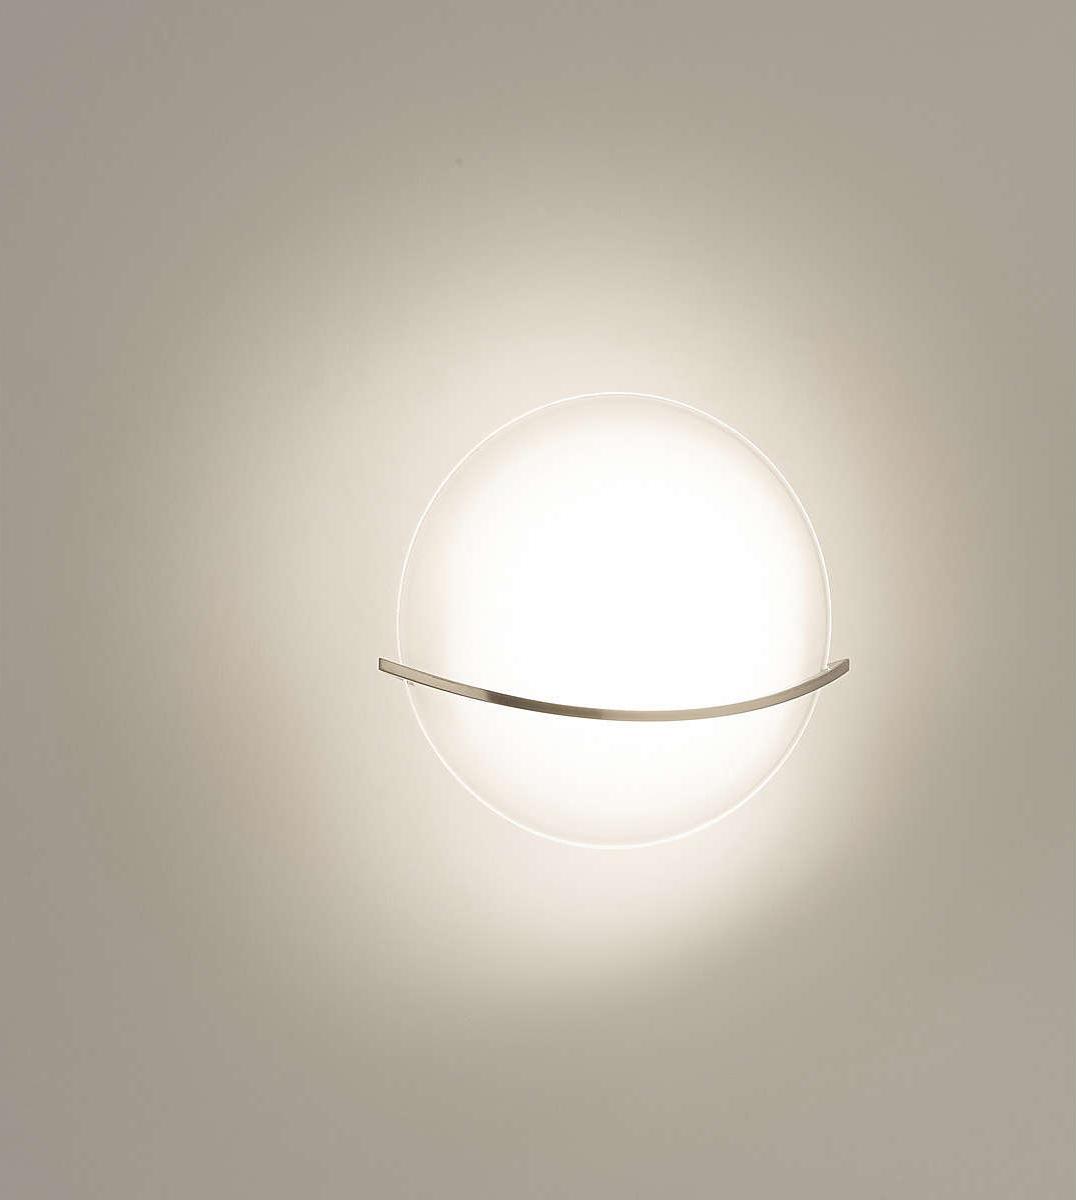 PHILIPS LED svietidlo moderné nástenné Buckeye chrome 1x3W - 33051/11/16